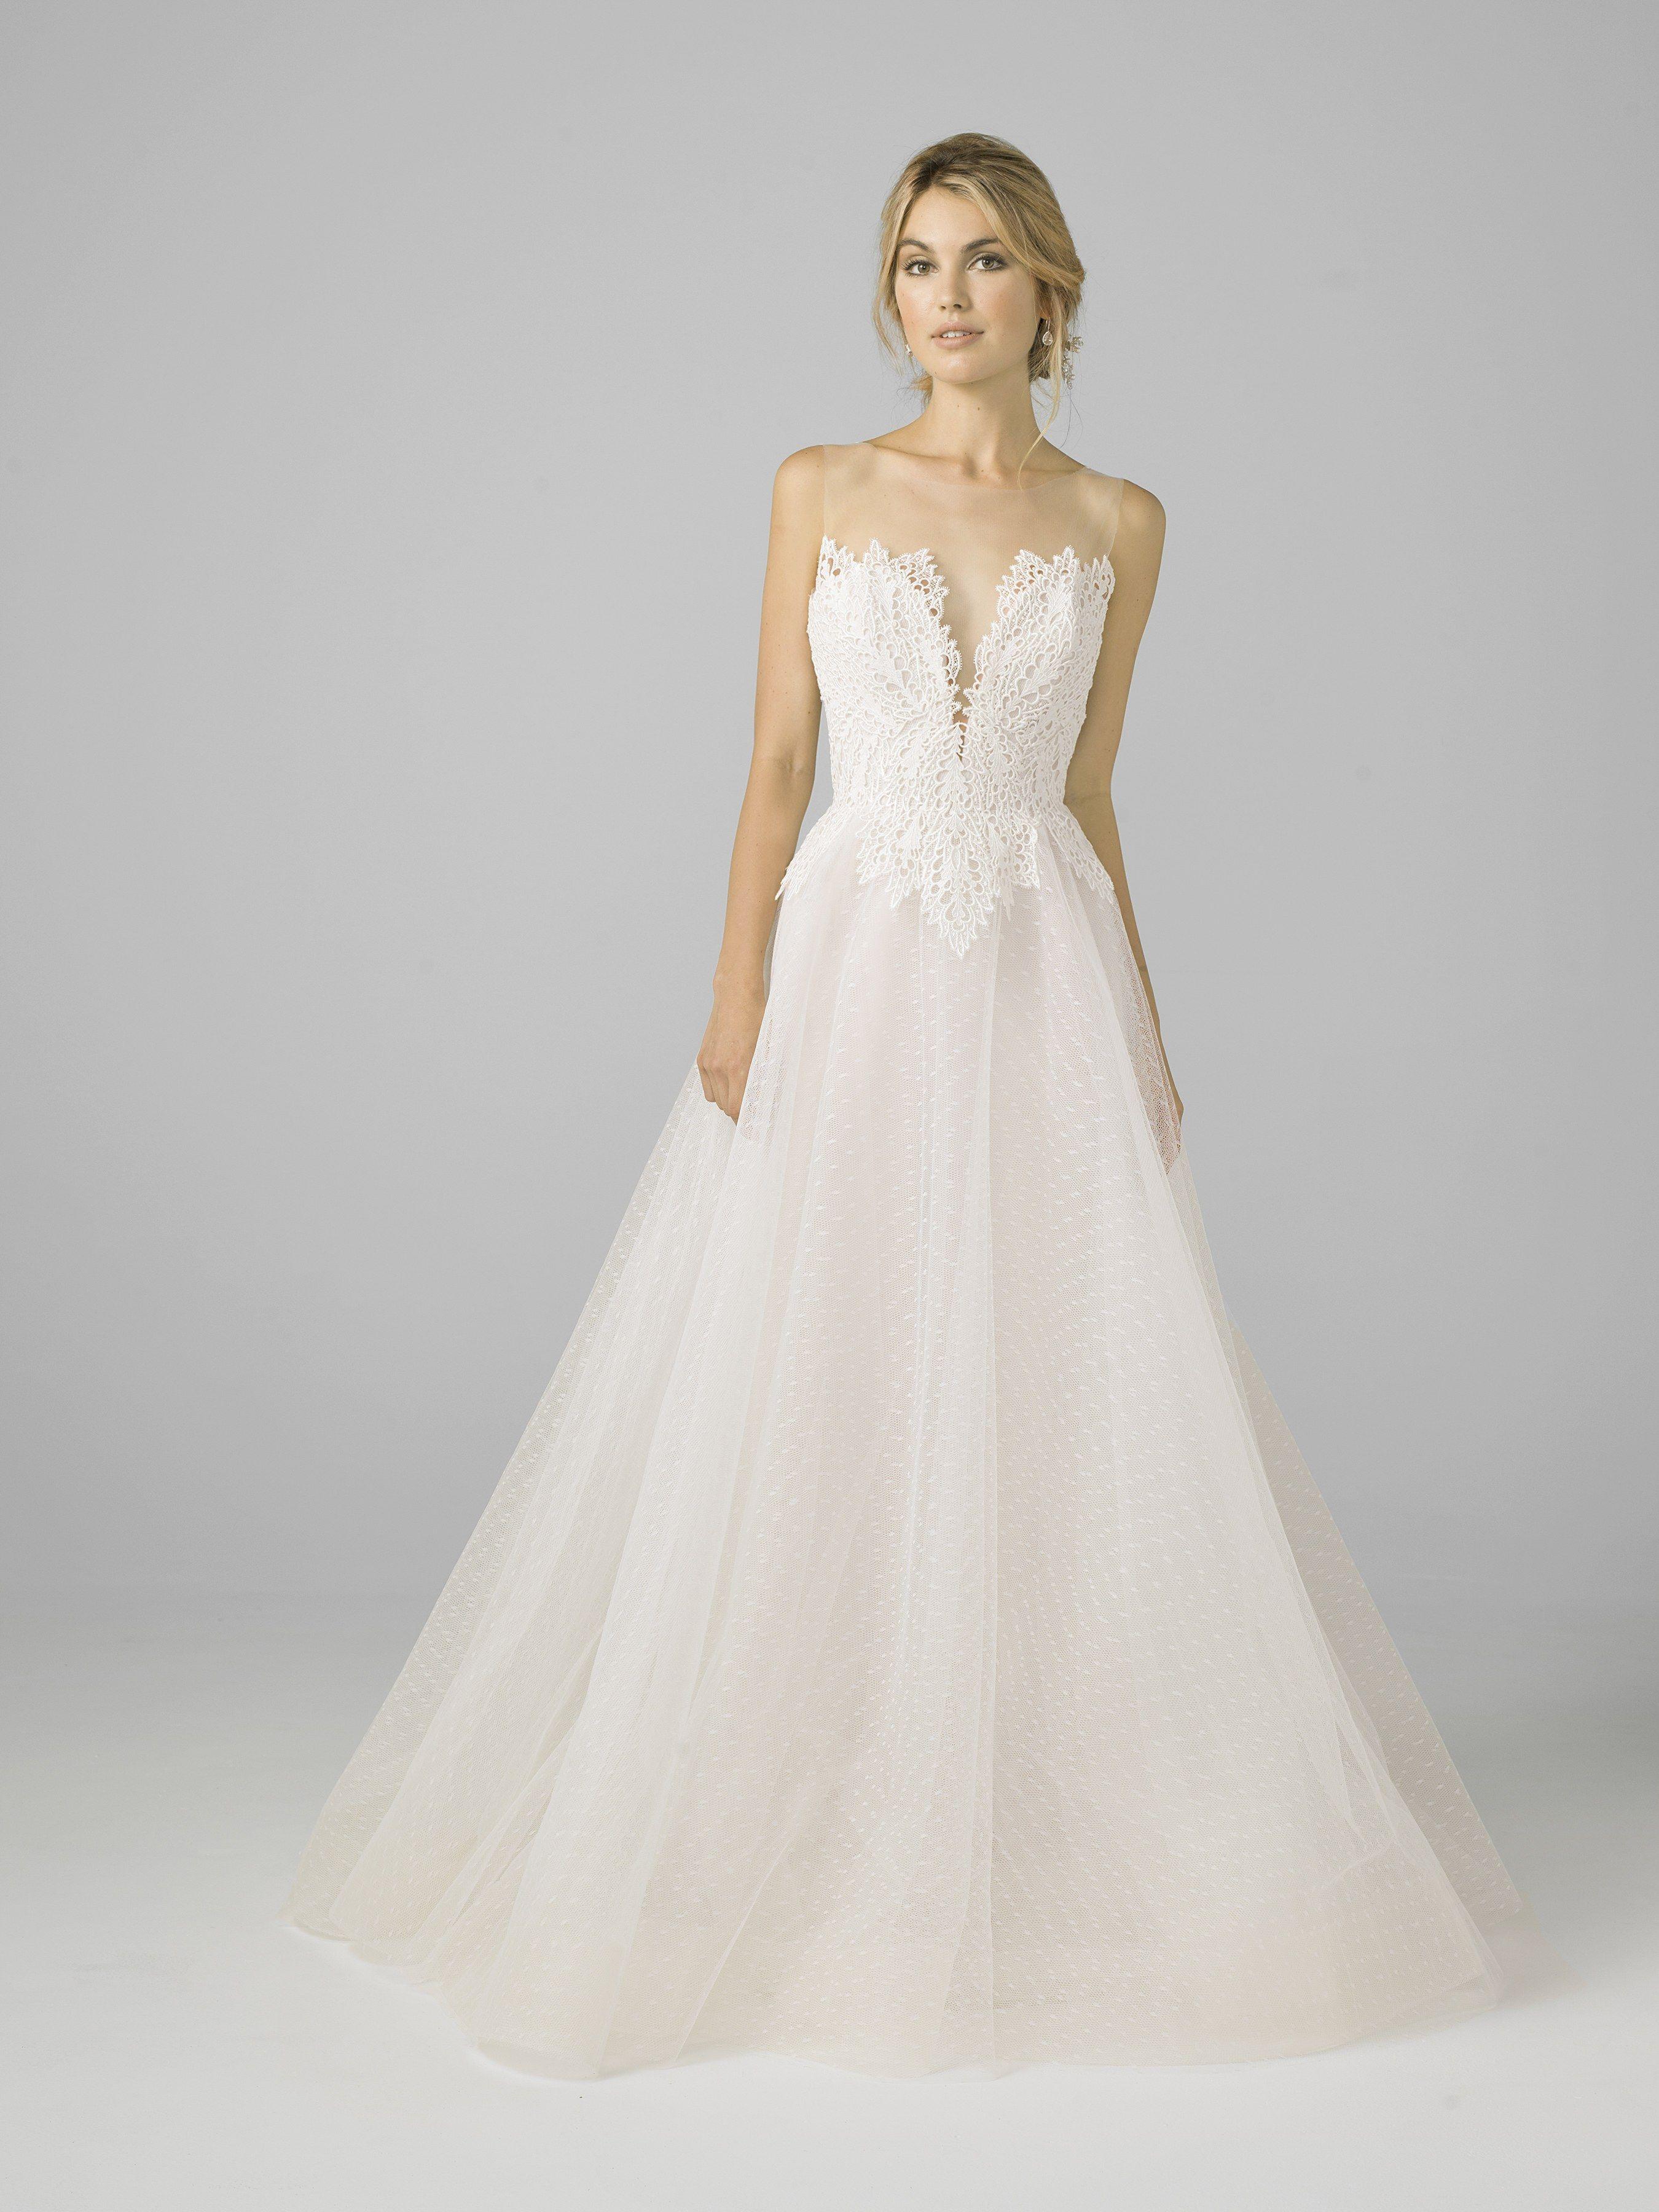 Elite wedding dresses  Azul by Liancarlo Fall  needs more shape  Wedding dresses